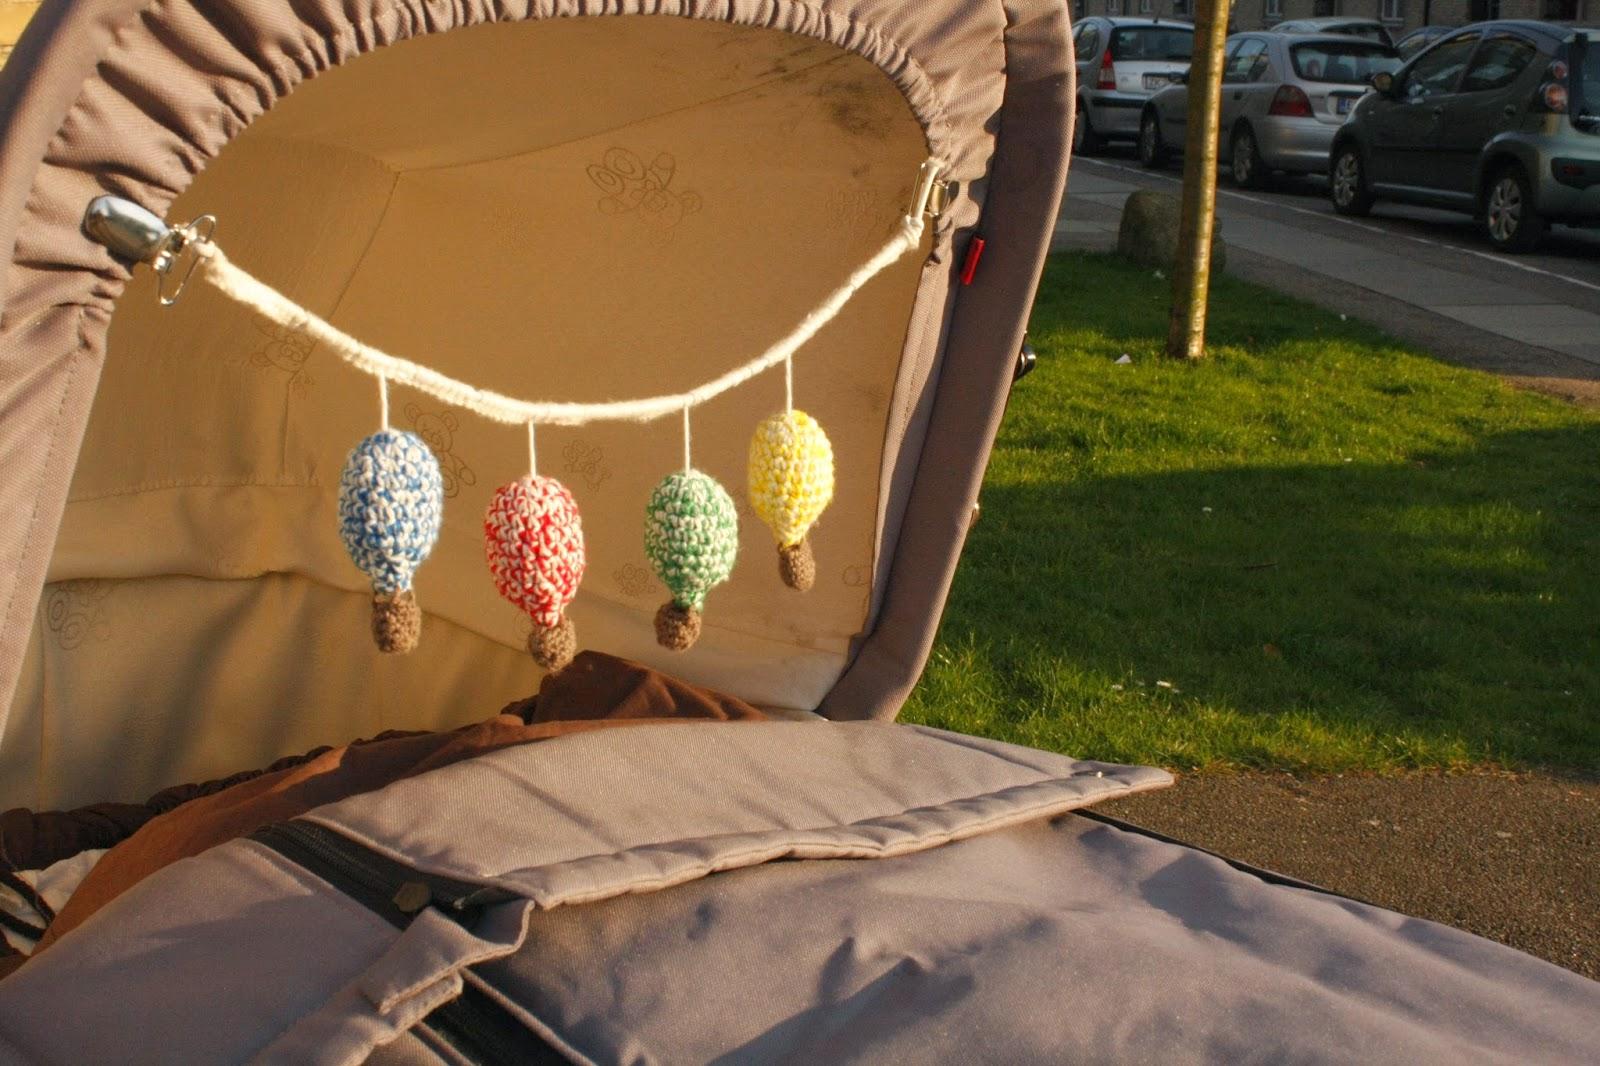 hæklet barnevognskæde med luftballoner